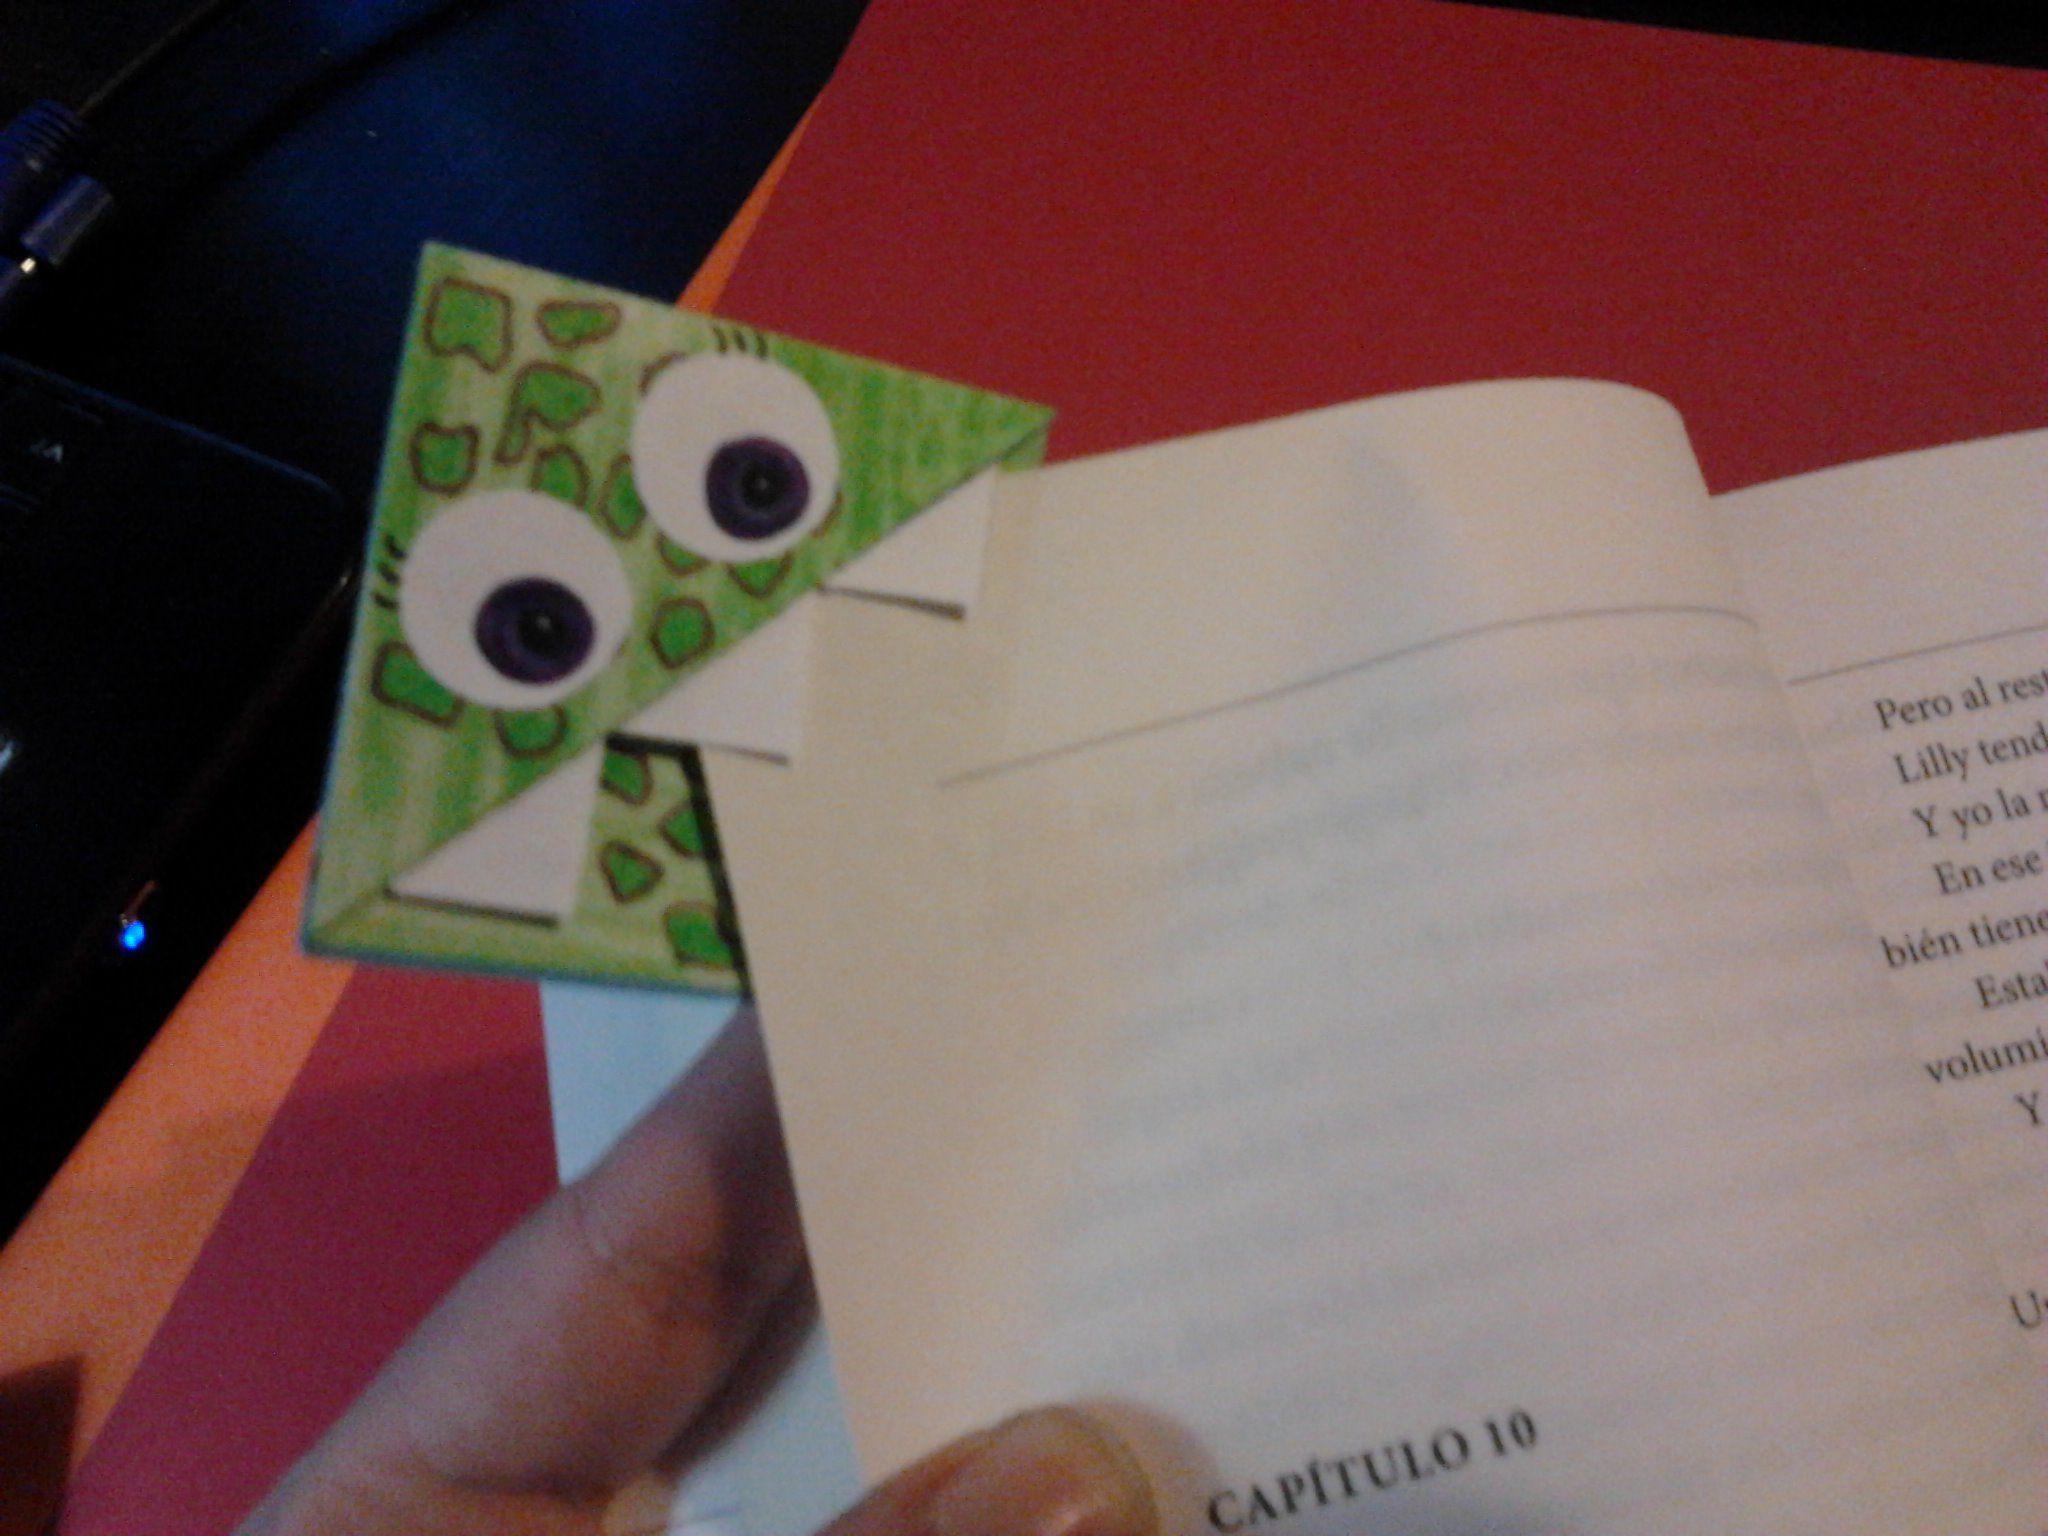 Separador de monstruito para los libros.